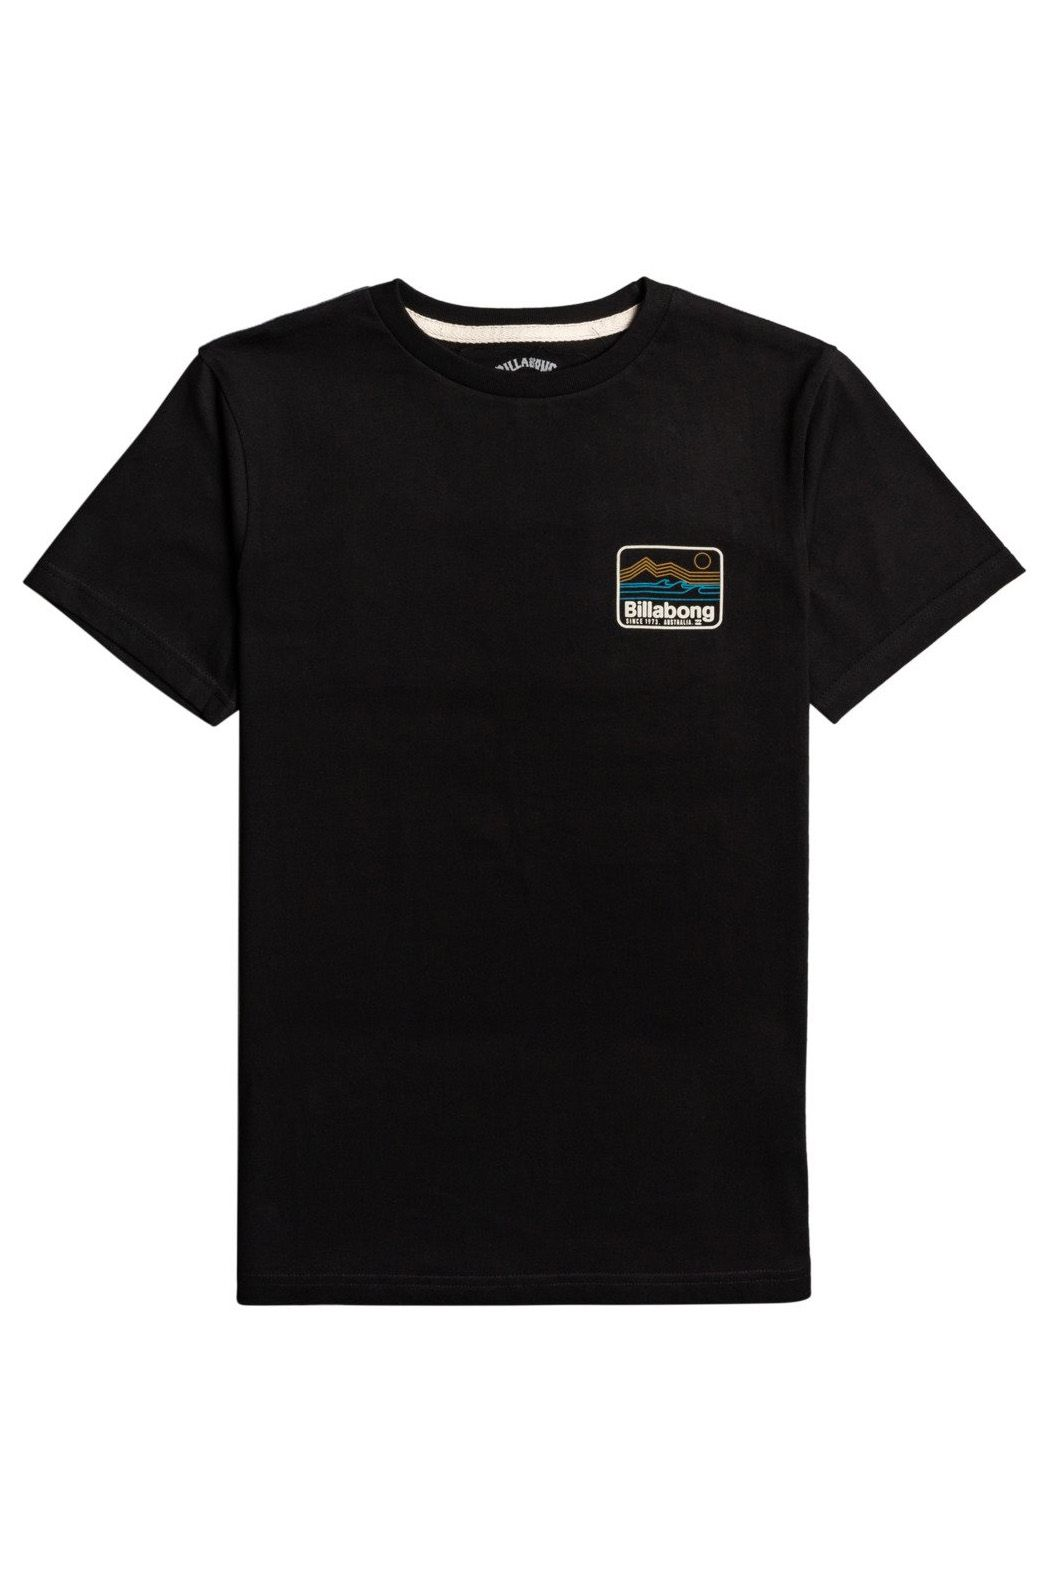 T-Shirt Billabong DREAM COAST SS BOY SPORTING GOOD PROGR. Black